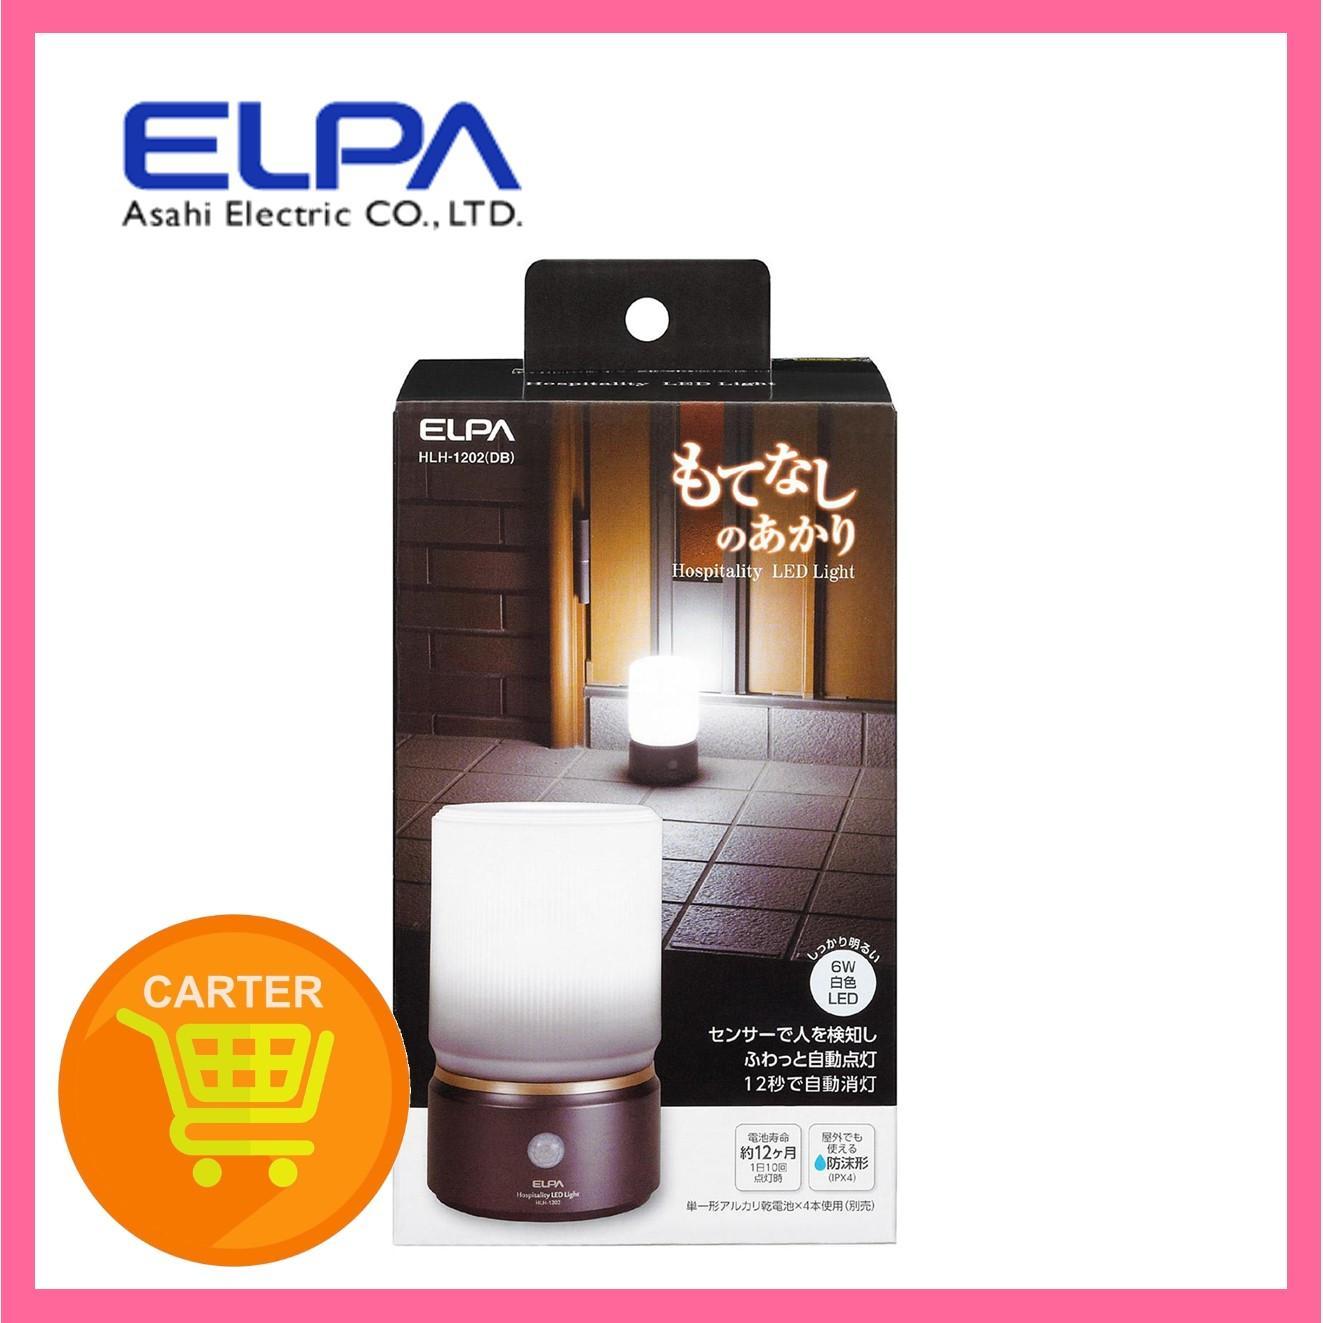 ELPA Hle-1202(Db) Led Motion Sensor Light